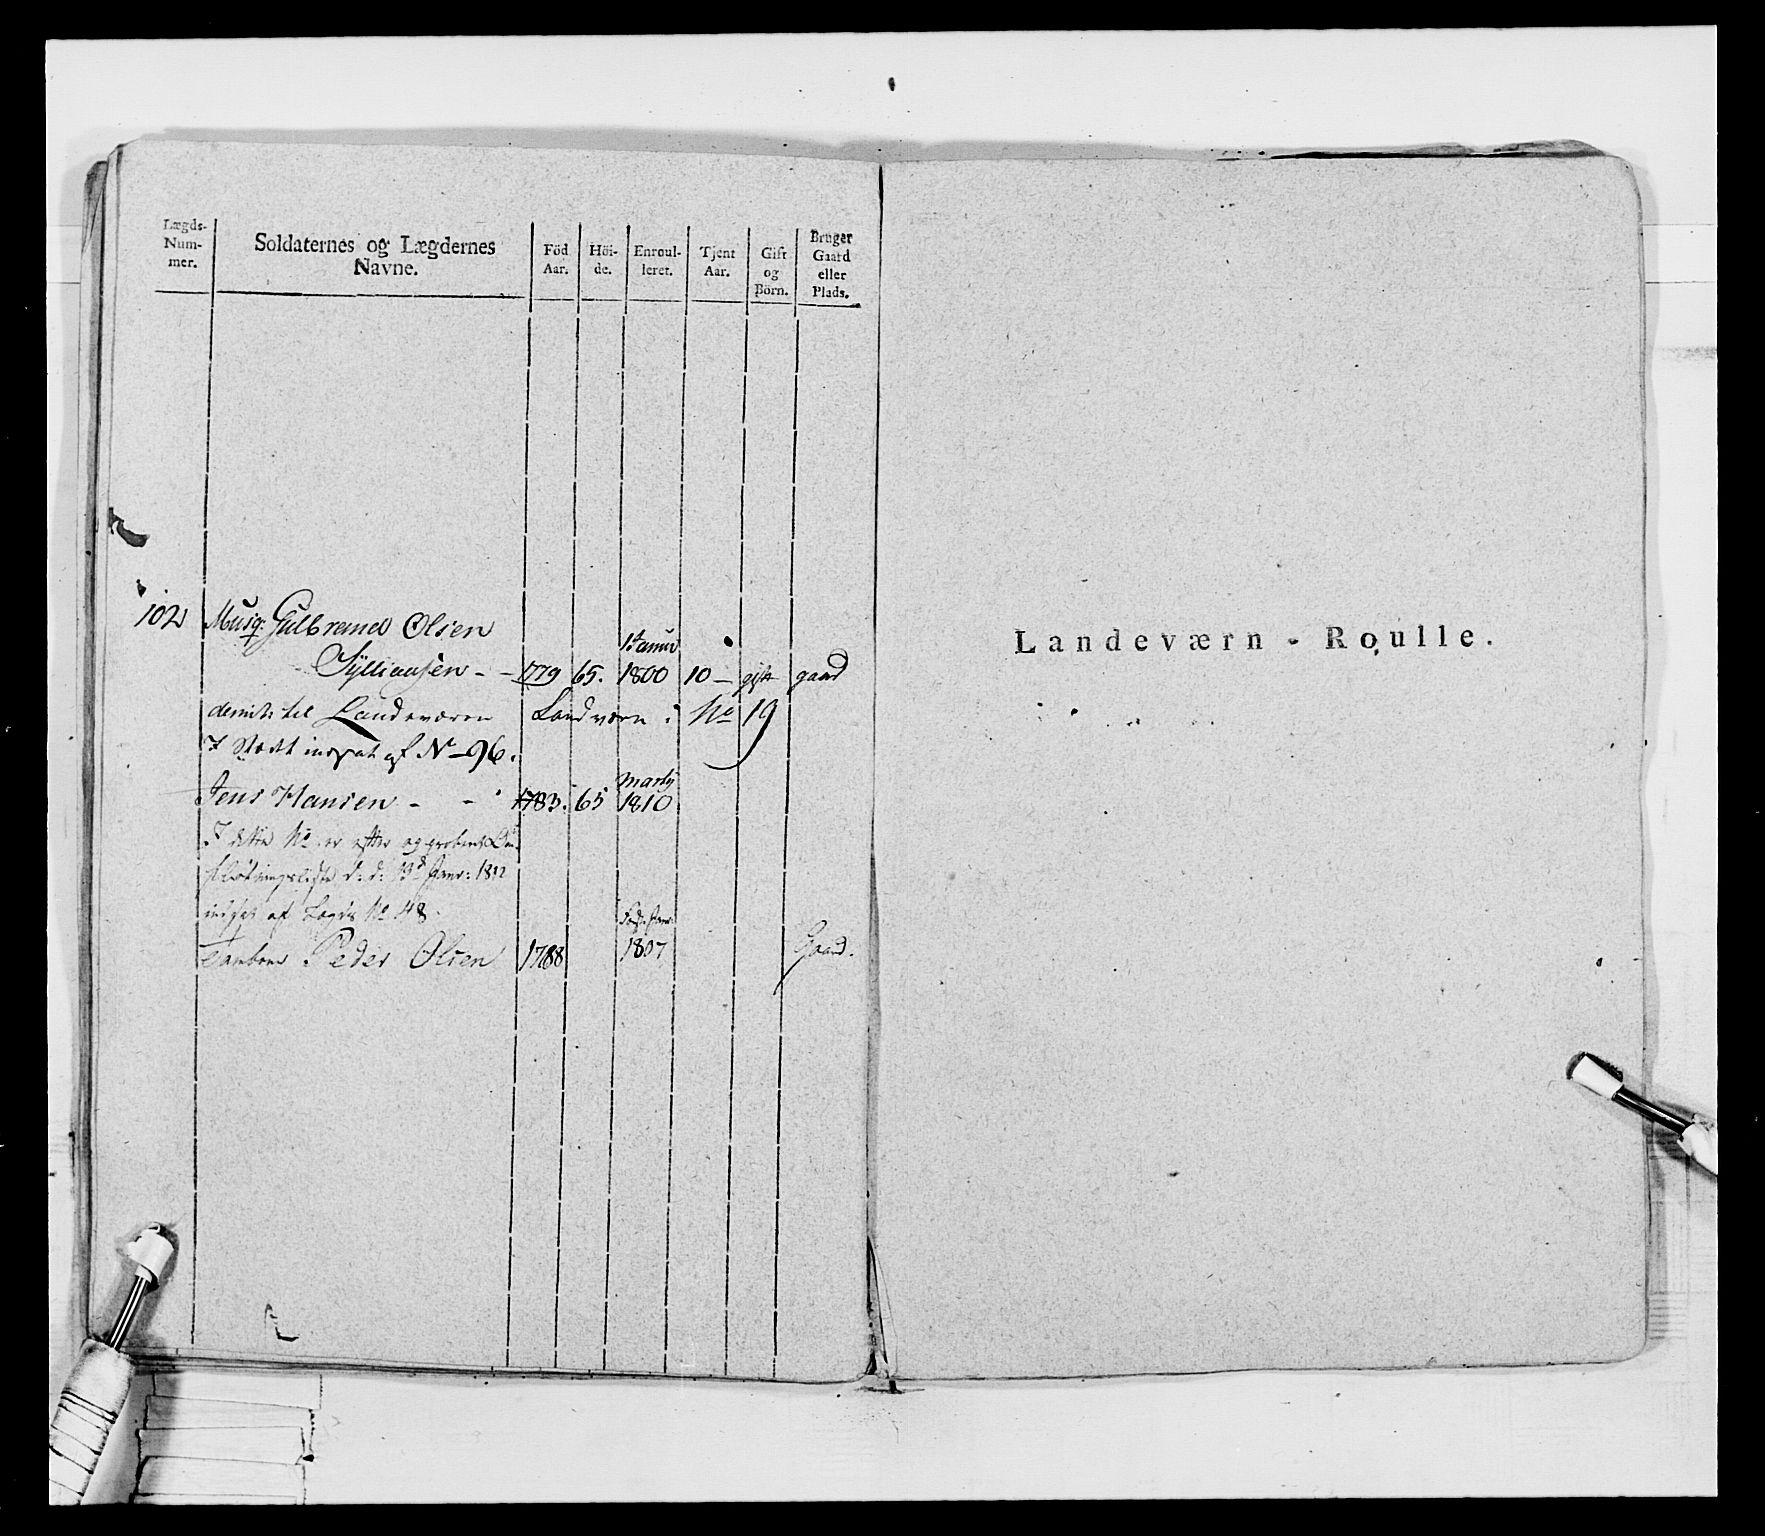 RA, Generalitets- og kommissariatskollegiet, Det kongelige norske kommissariatskollegium, E/Eh/L0069: Opplandske gevorbne infanteriregiment, 1810-1818, s. 90